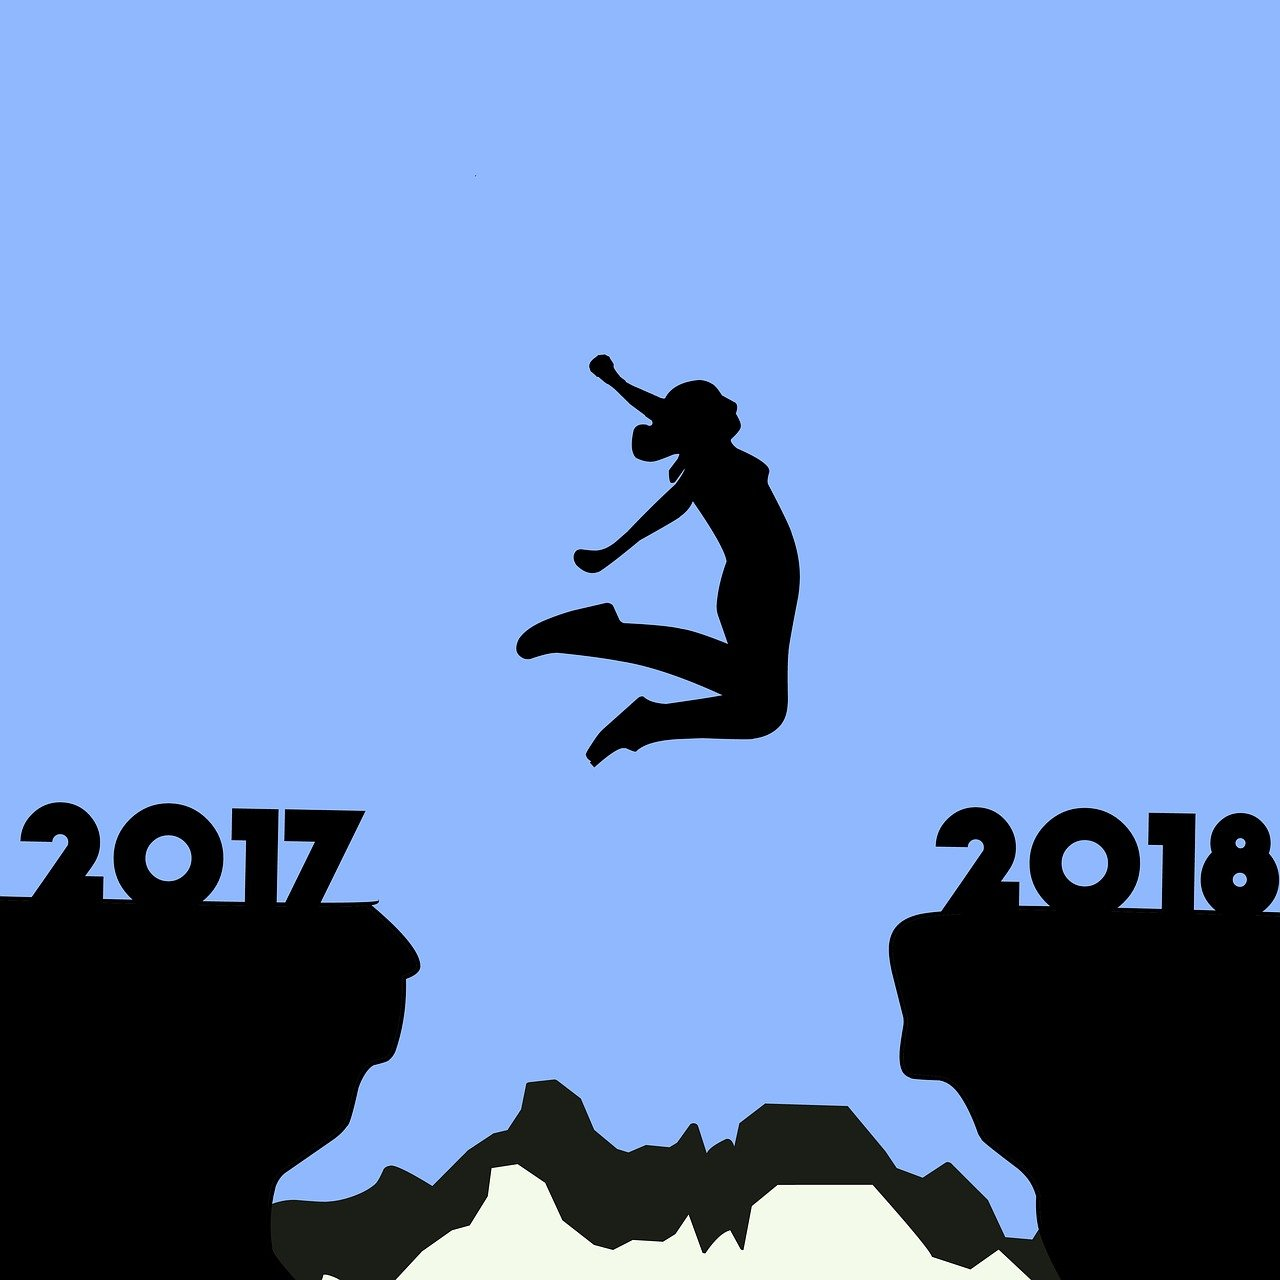 2017 goodbye photo